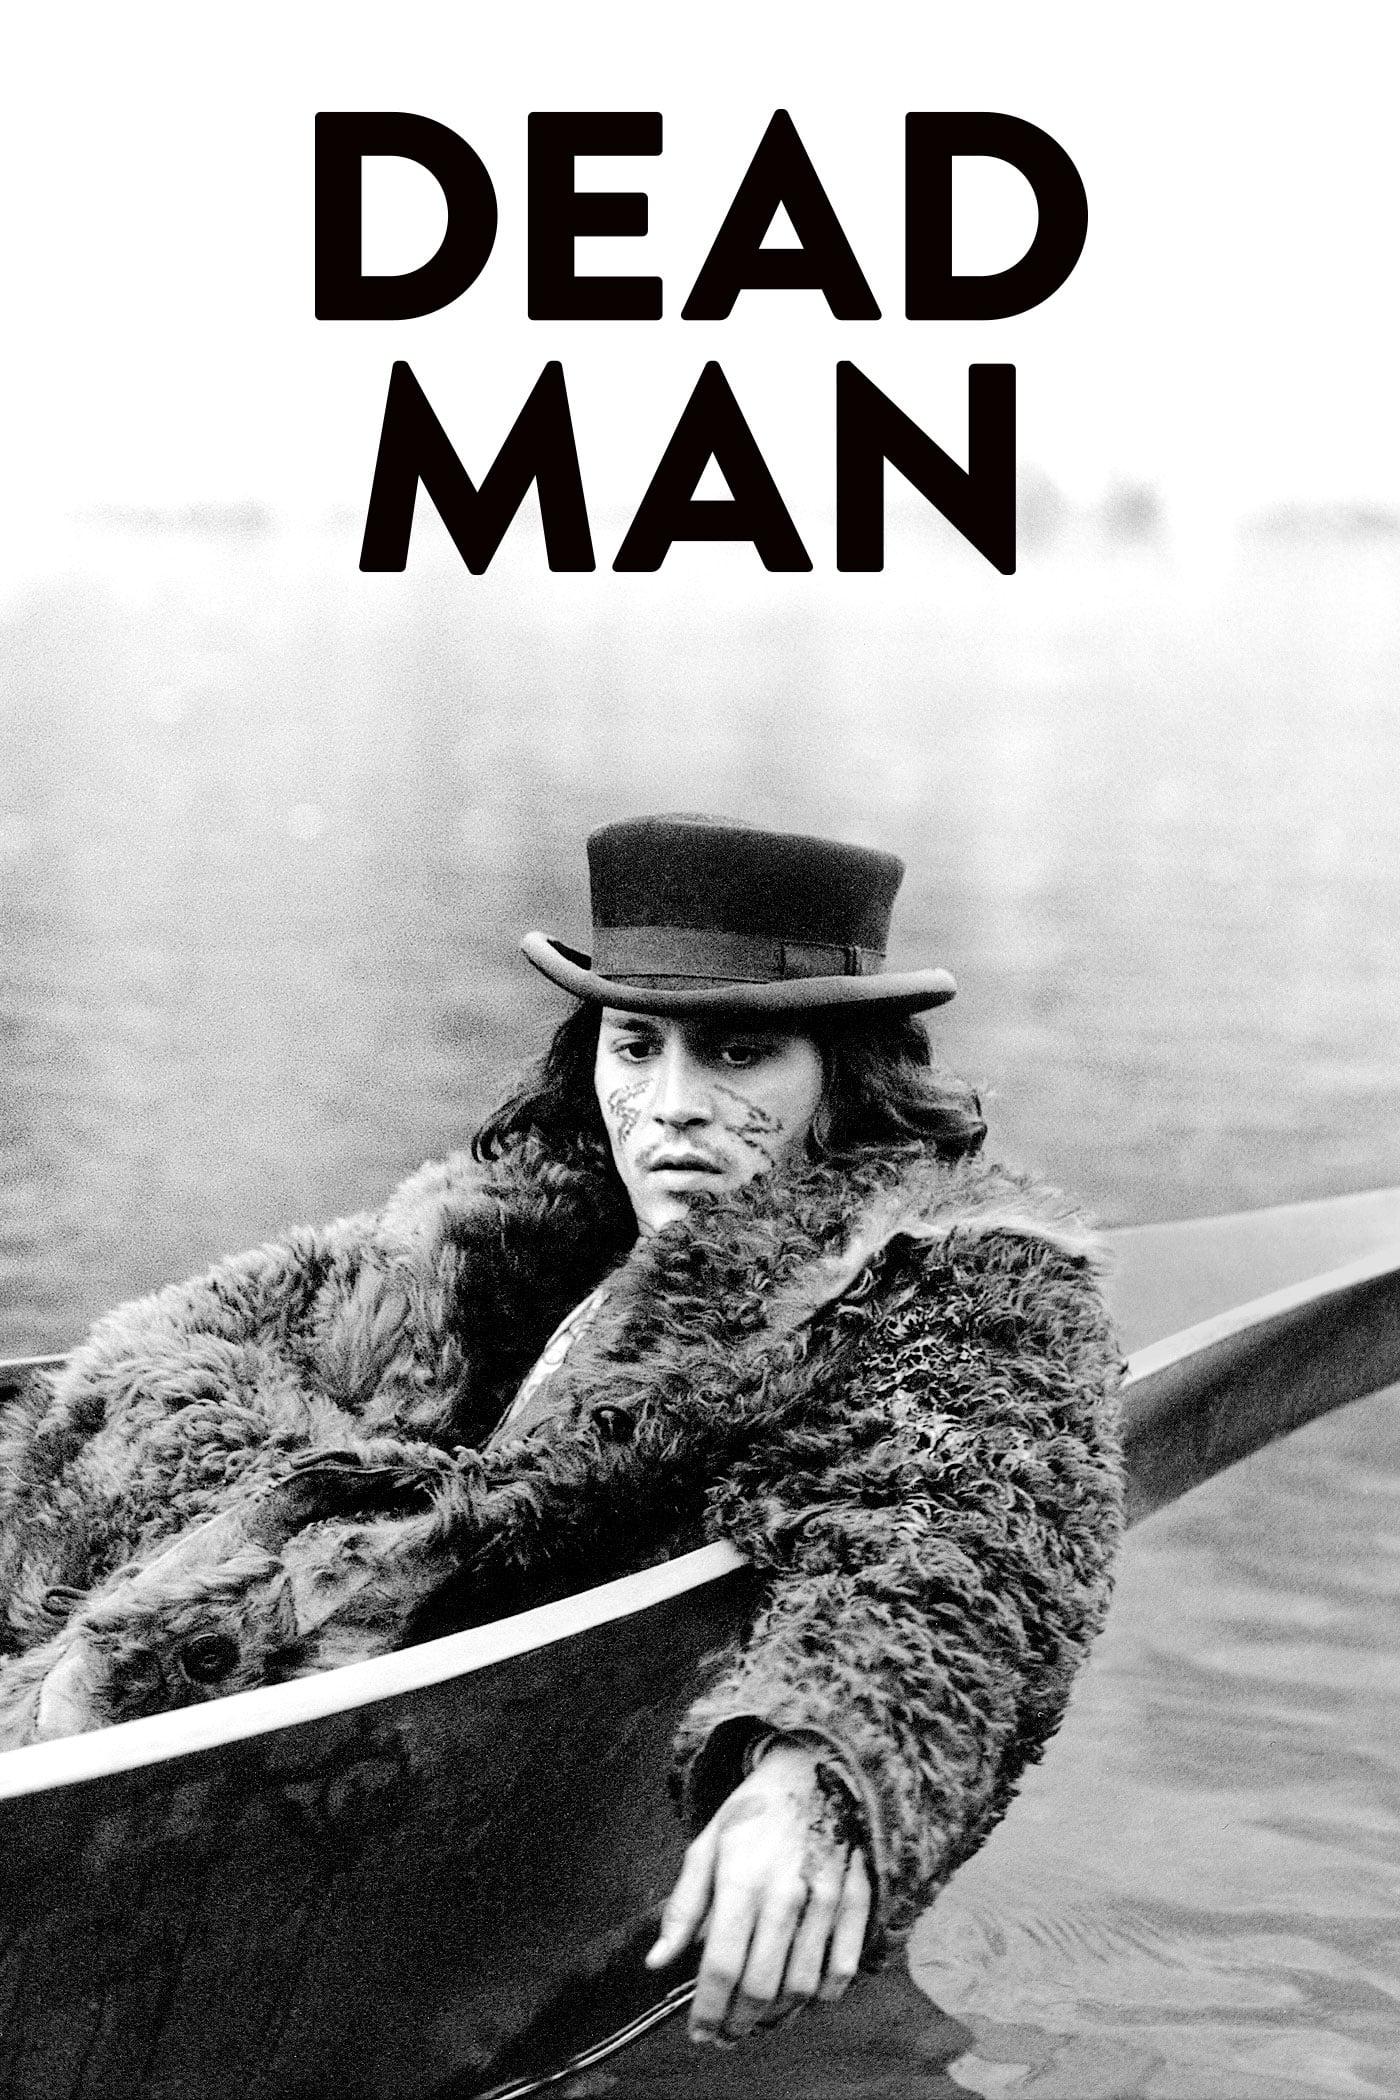 Poster for DEAD MAN